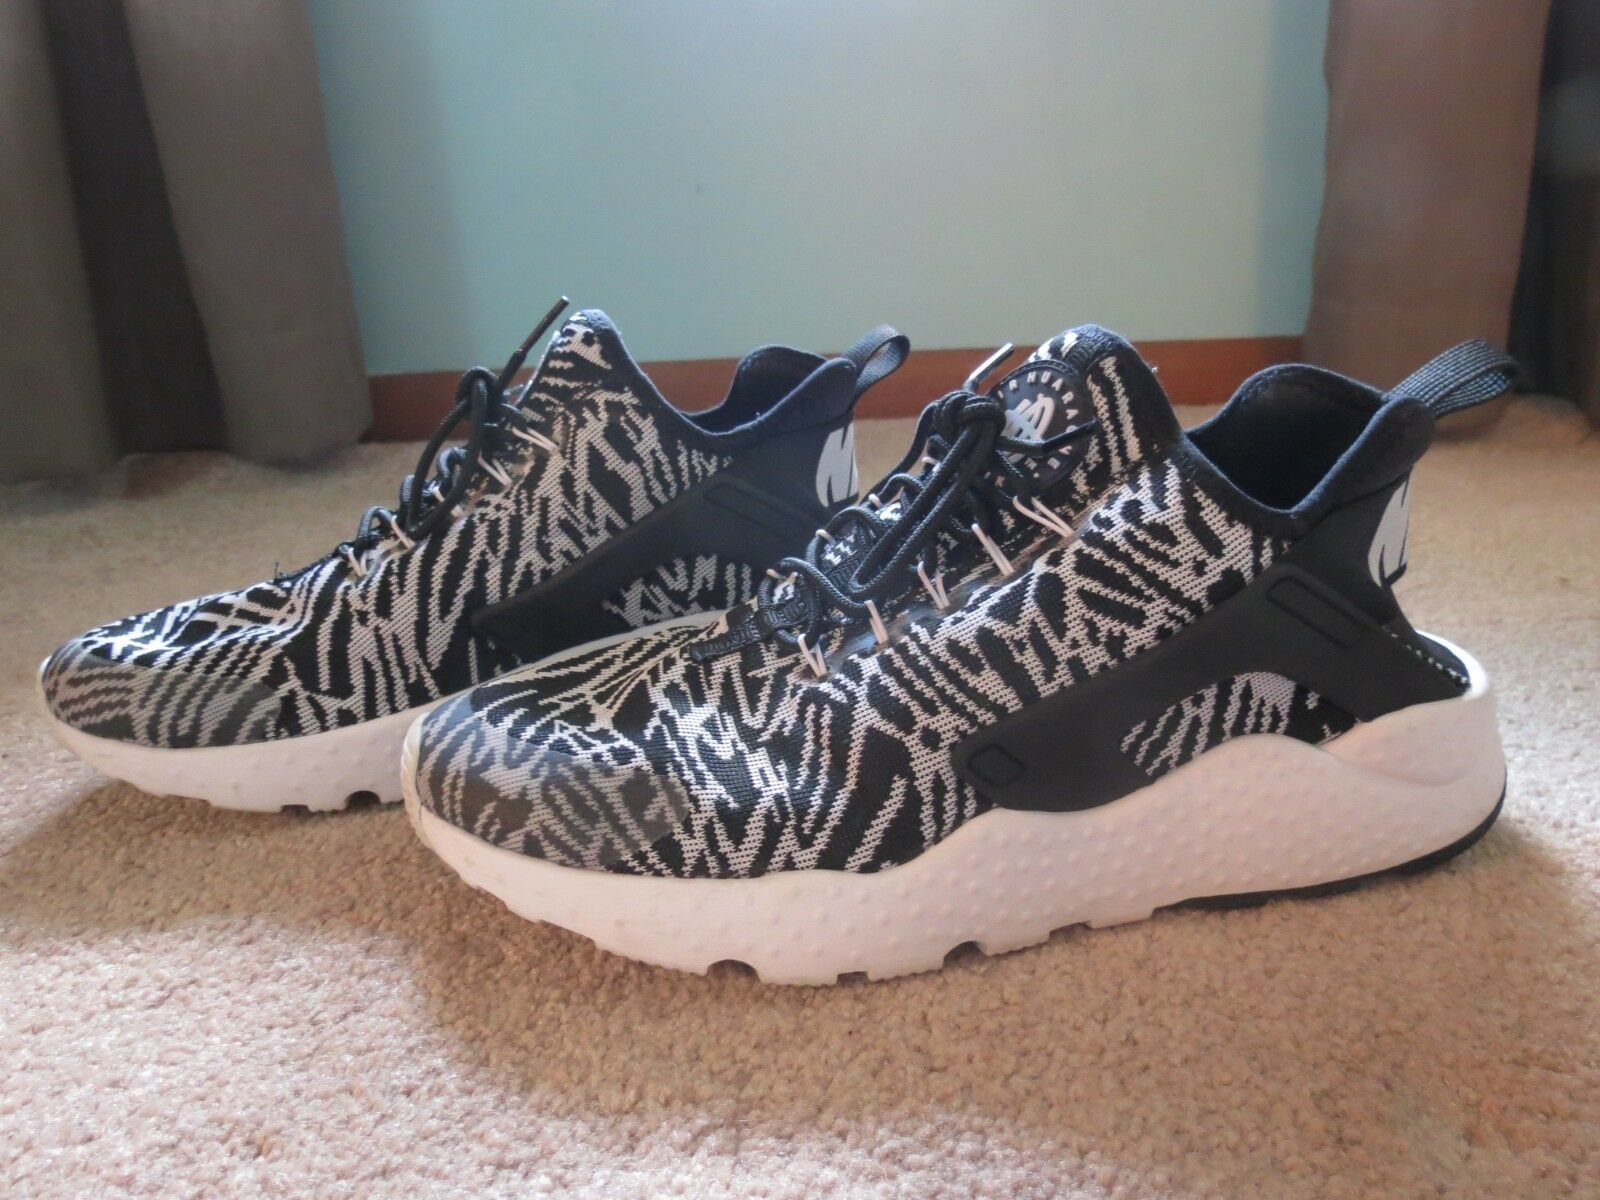 Nike air jordan 11 xi retrò Uomo basso ie scarpe taglia 10 scorza d'argento 306008 072